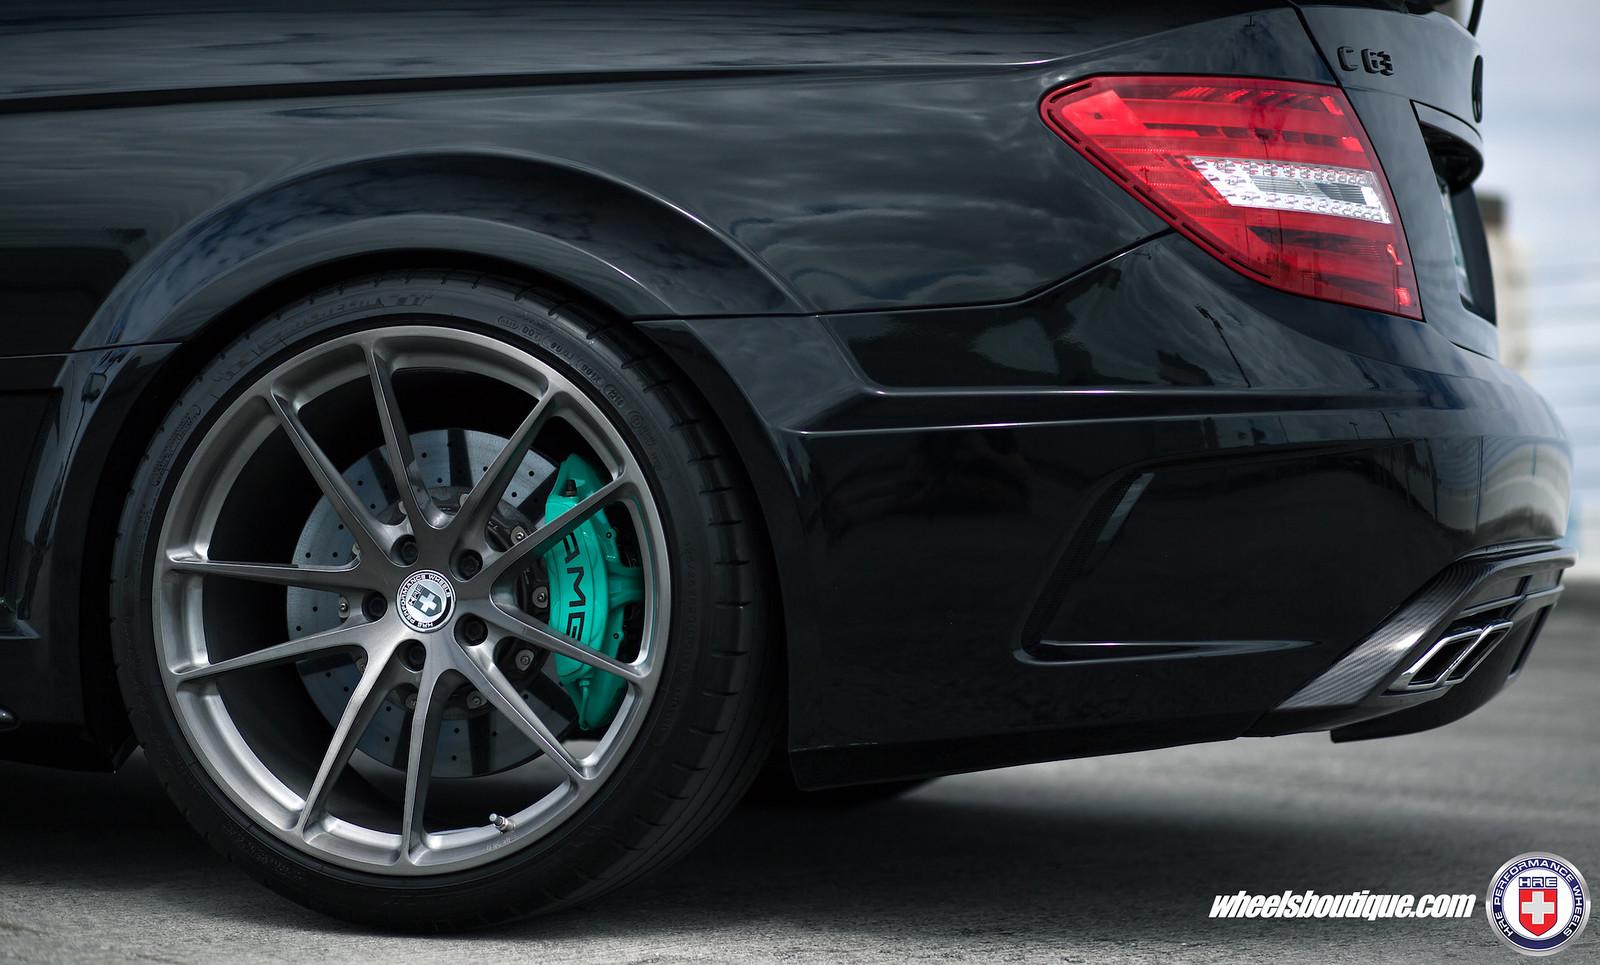 All Types amg black series wheels : C63 Black Series Exhaust - best option - MBWorld.org Forums